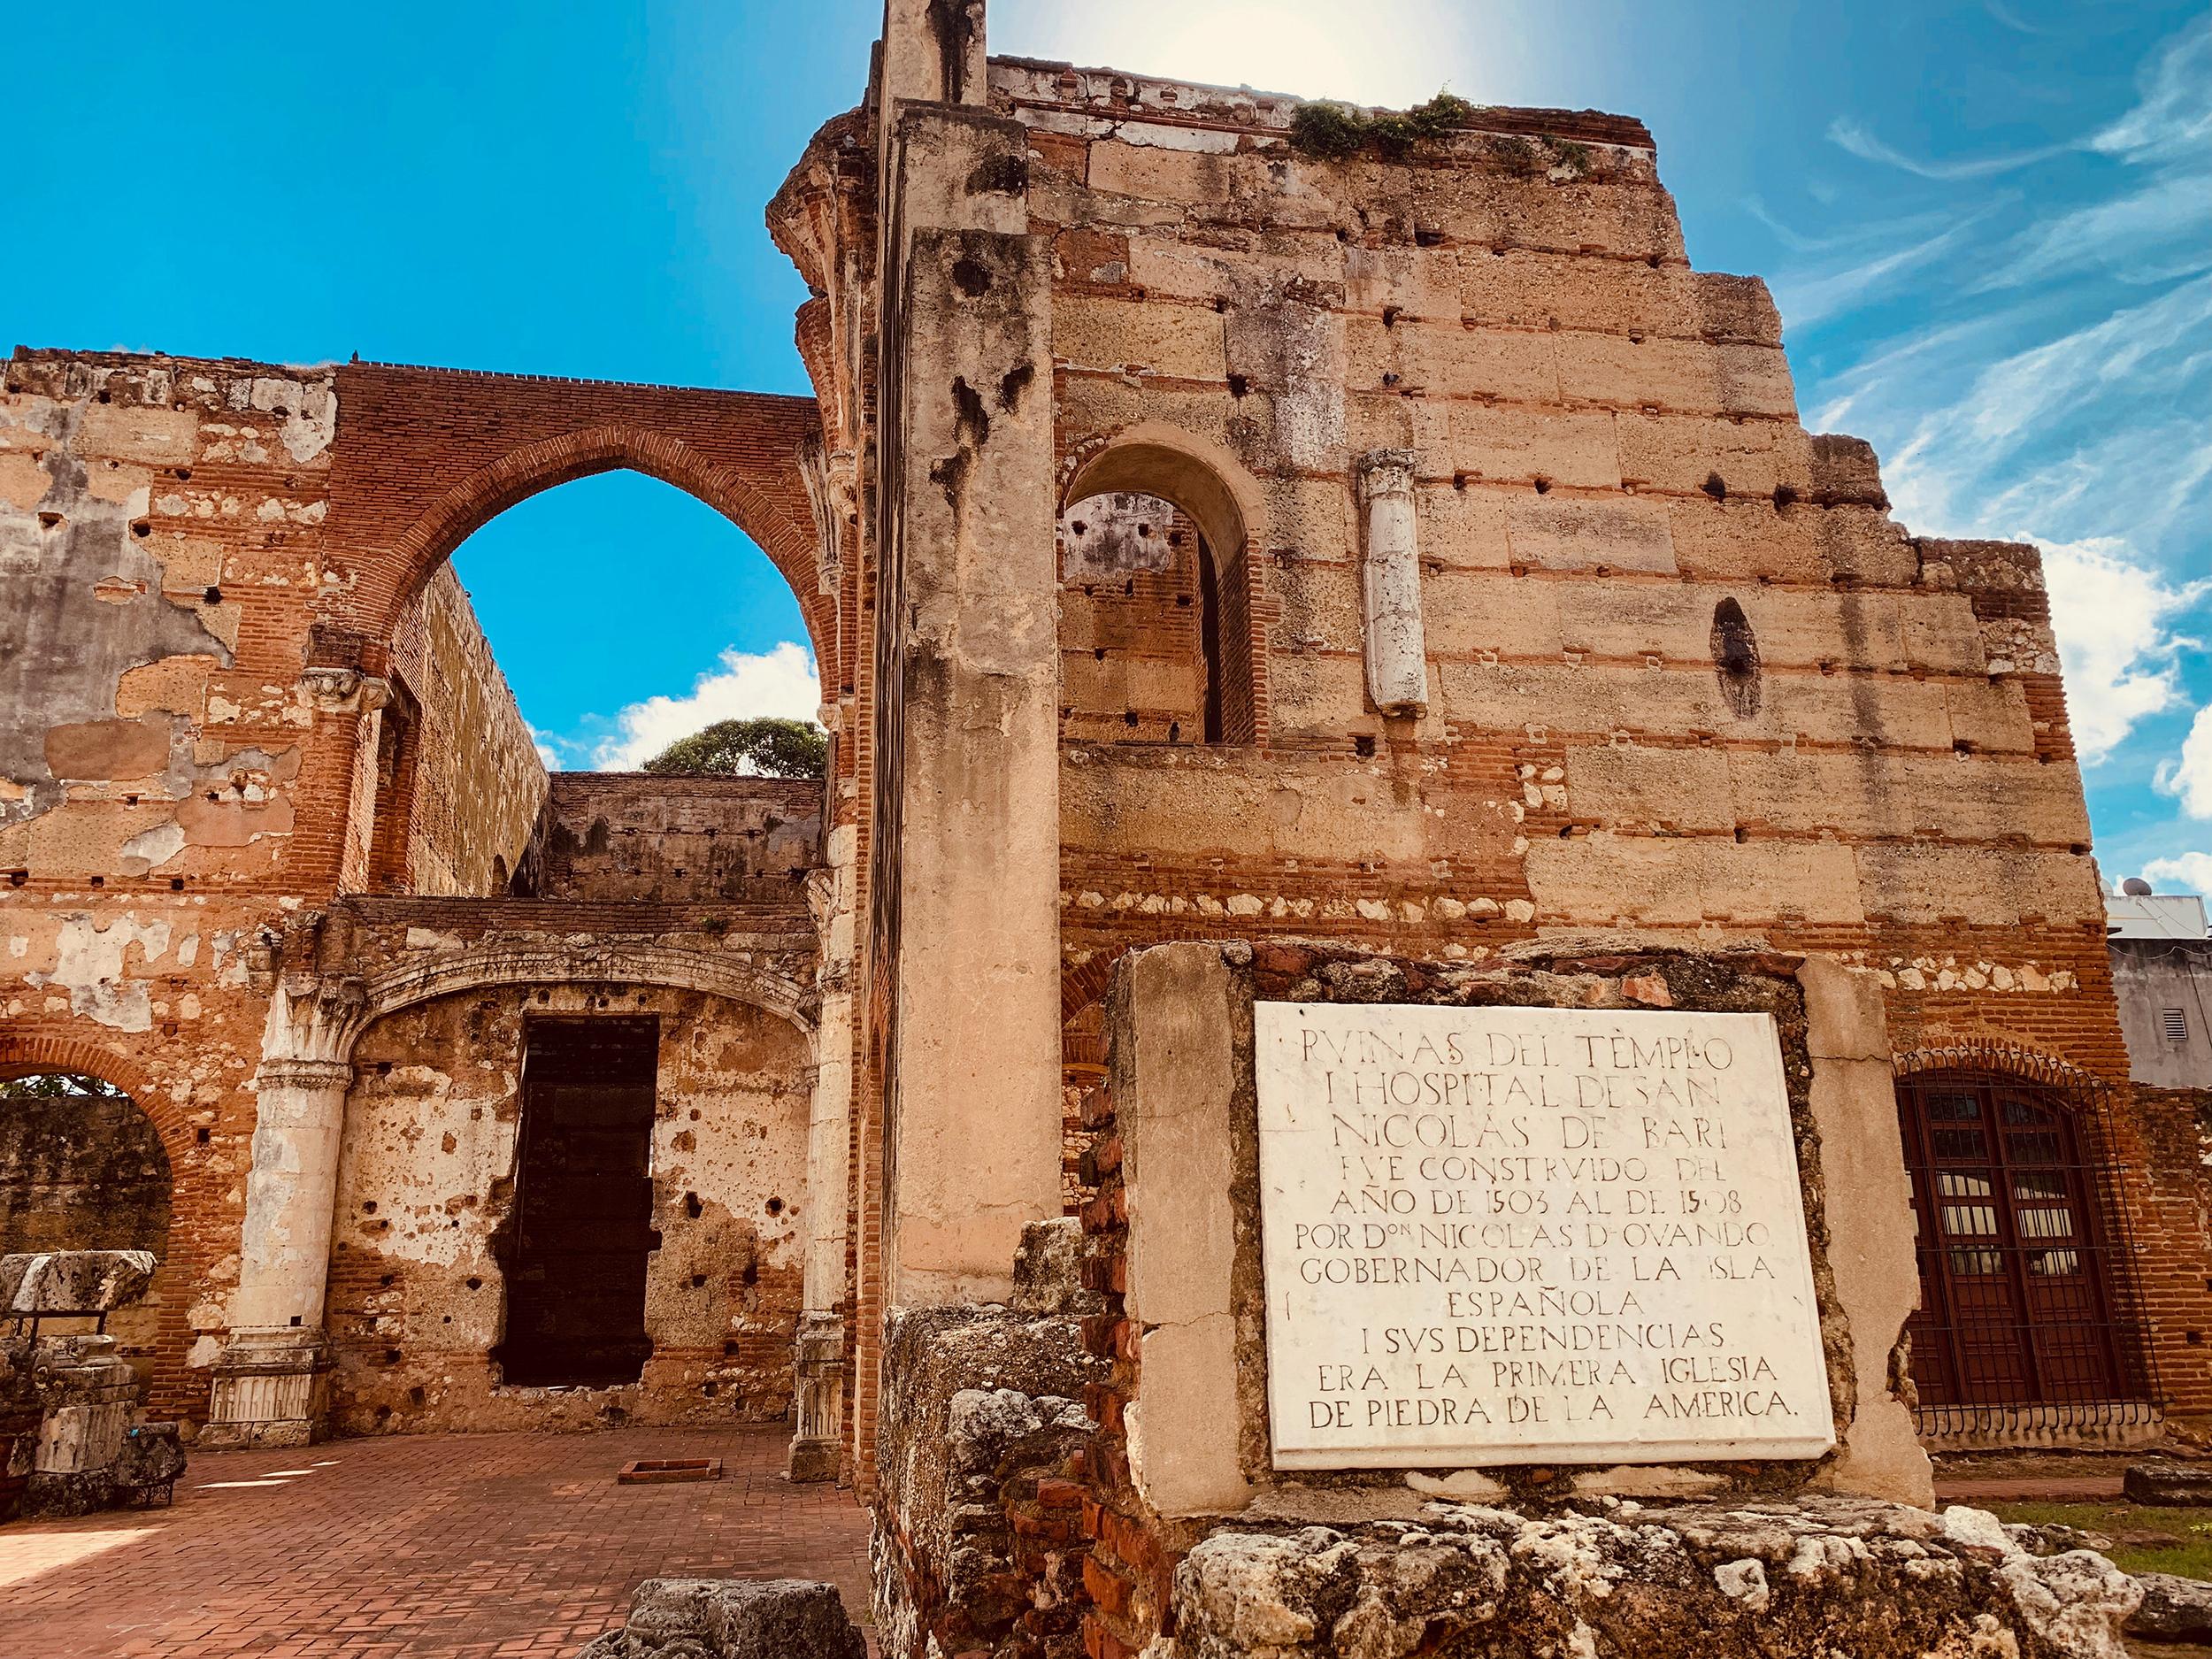 Hospital San Nicolás de Bari, the oldest hospital of the New World, now preserved ruins.